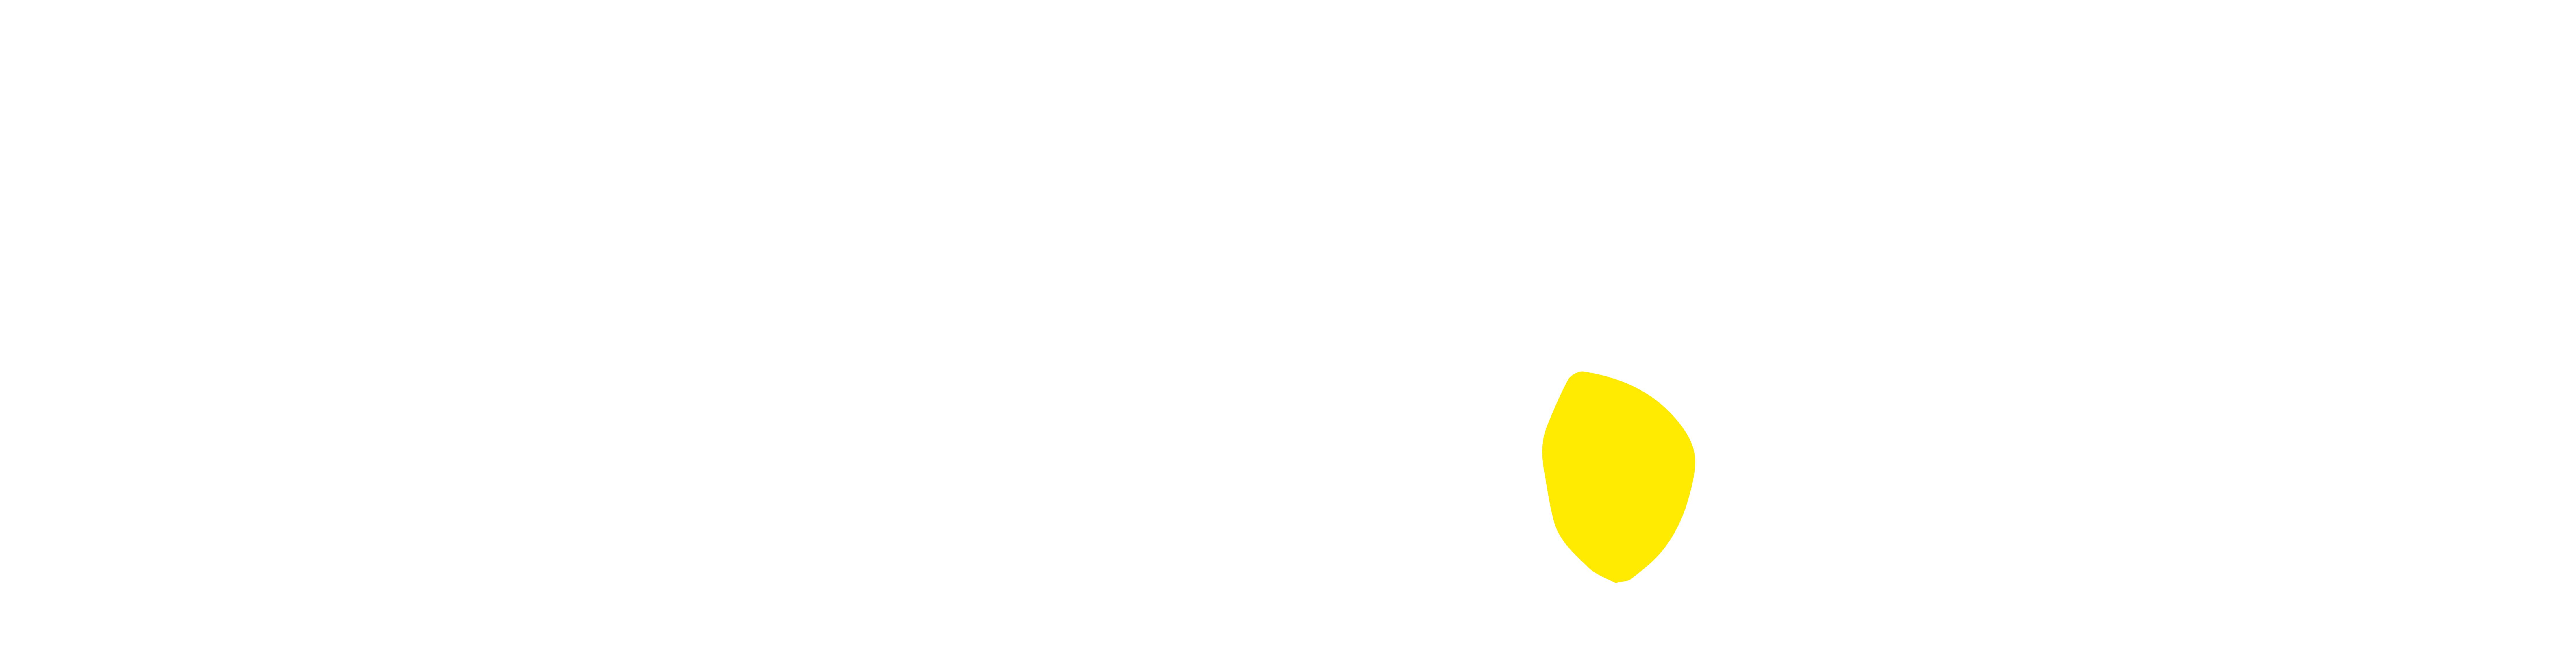 Variaton Projektorchester